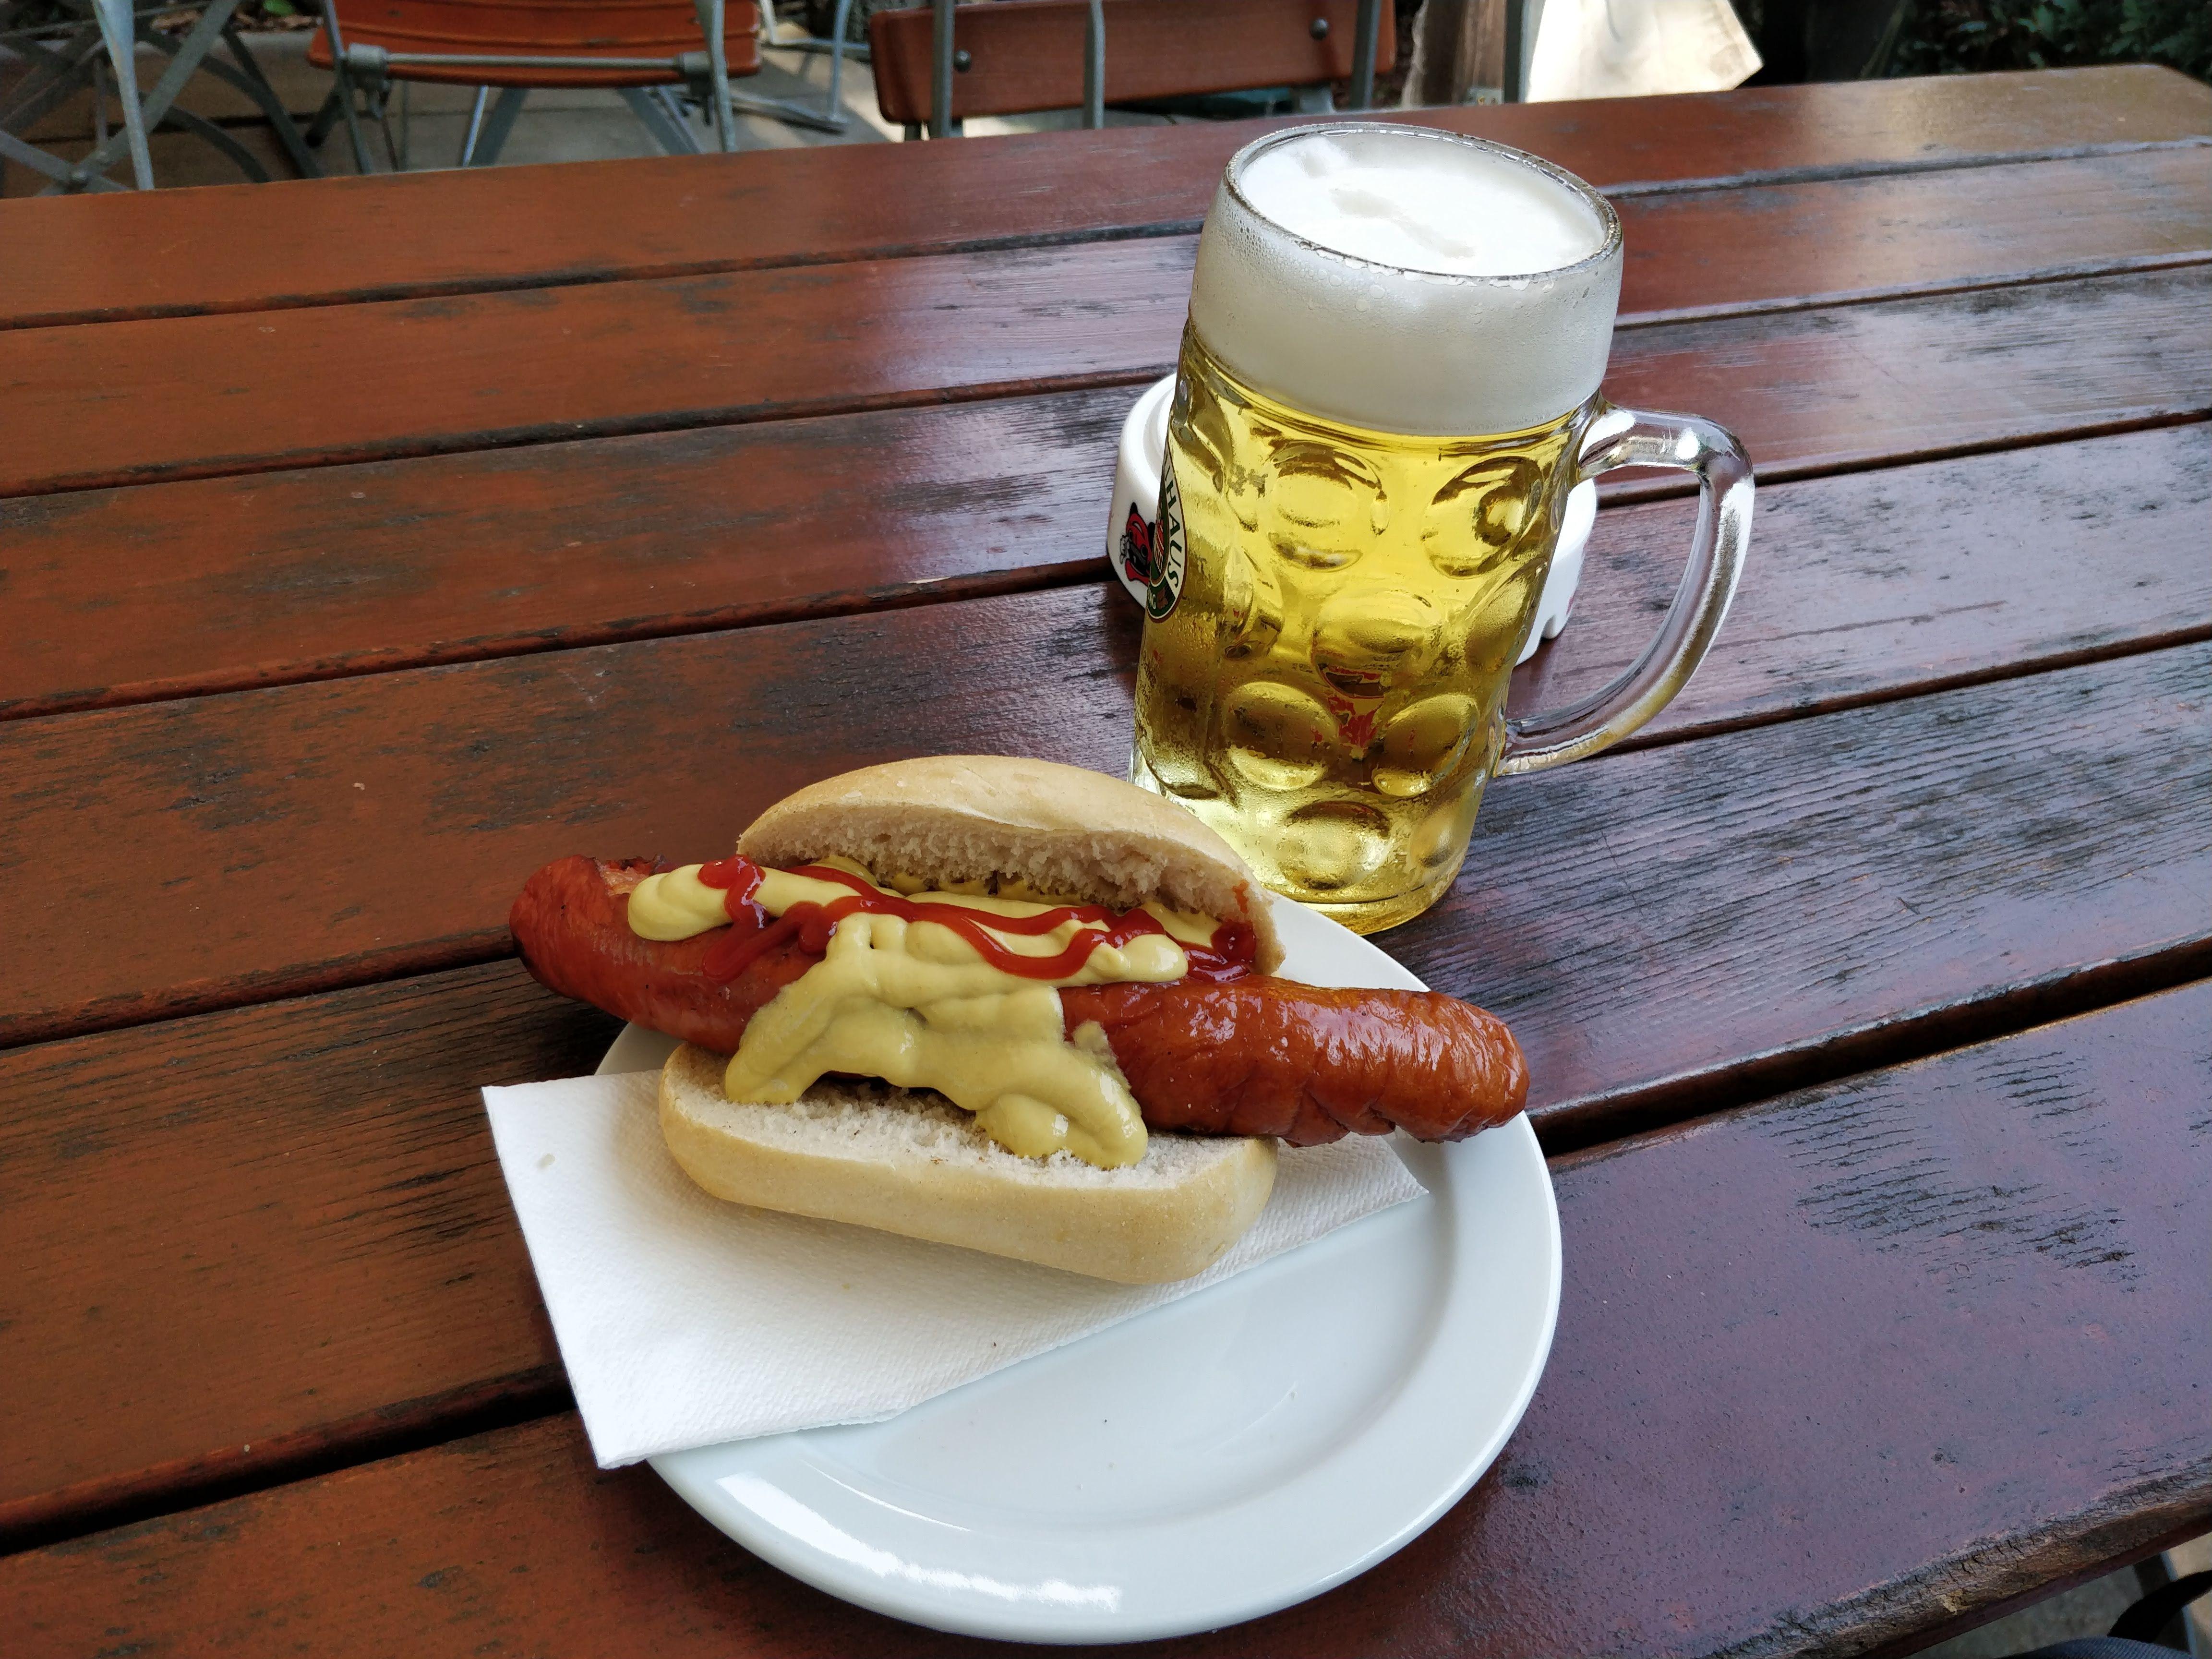 https://foodloader.net/nico_2018-08-18_rote-wurst-im-brot.jpg